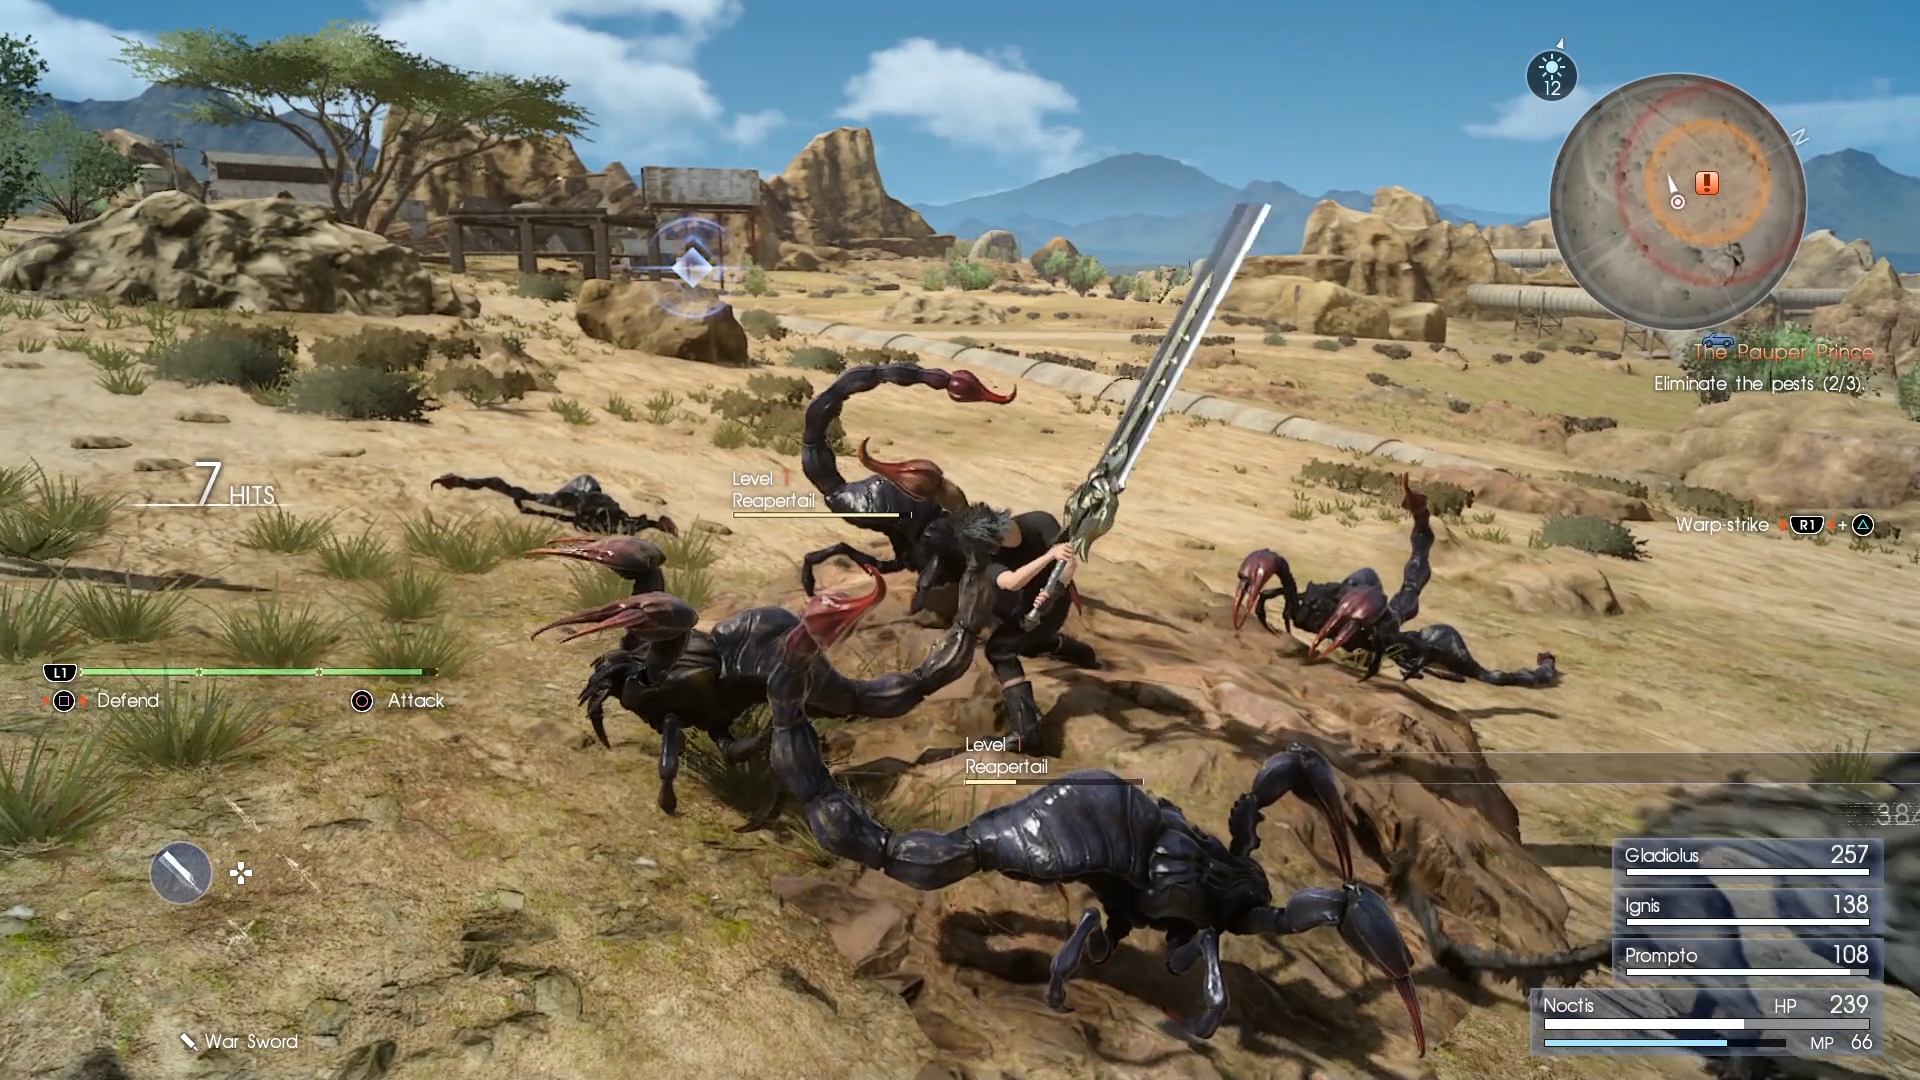 Znalezione obrazy dla zapytania final fantasy xv combat